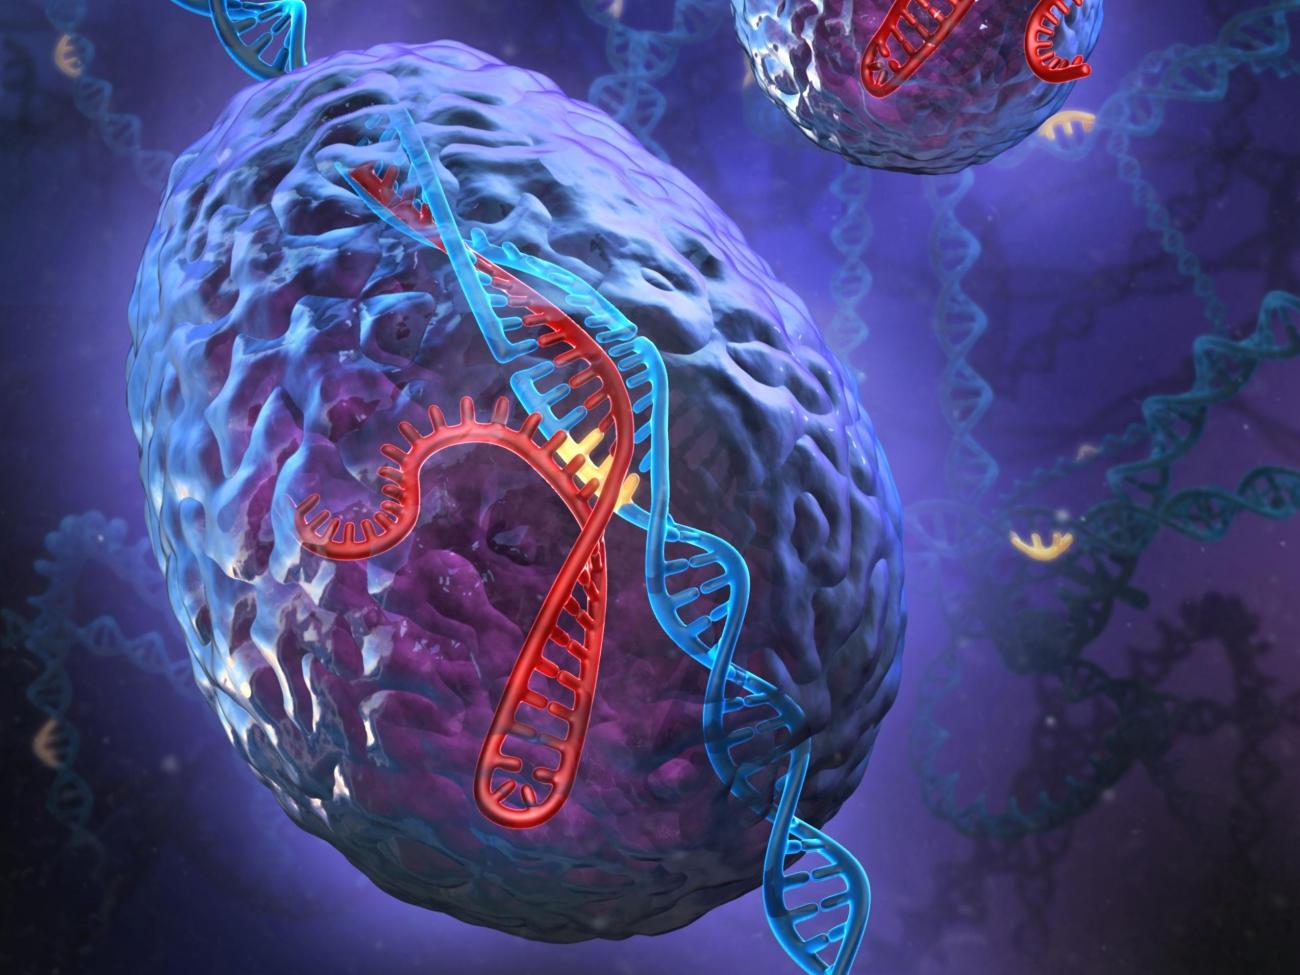 Allergan Just Got Access to Groundbreaking Gene-Editing Treatments for Eye Diseases